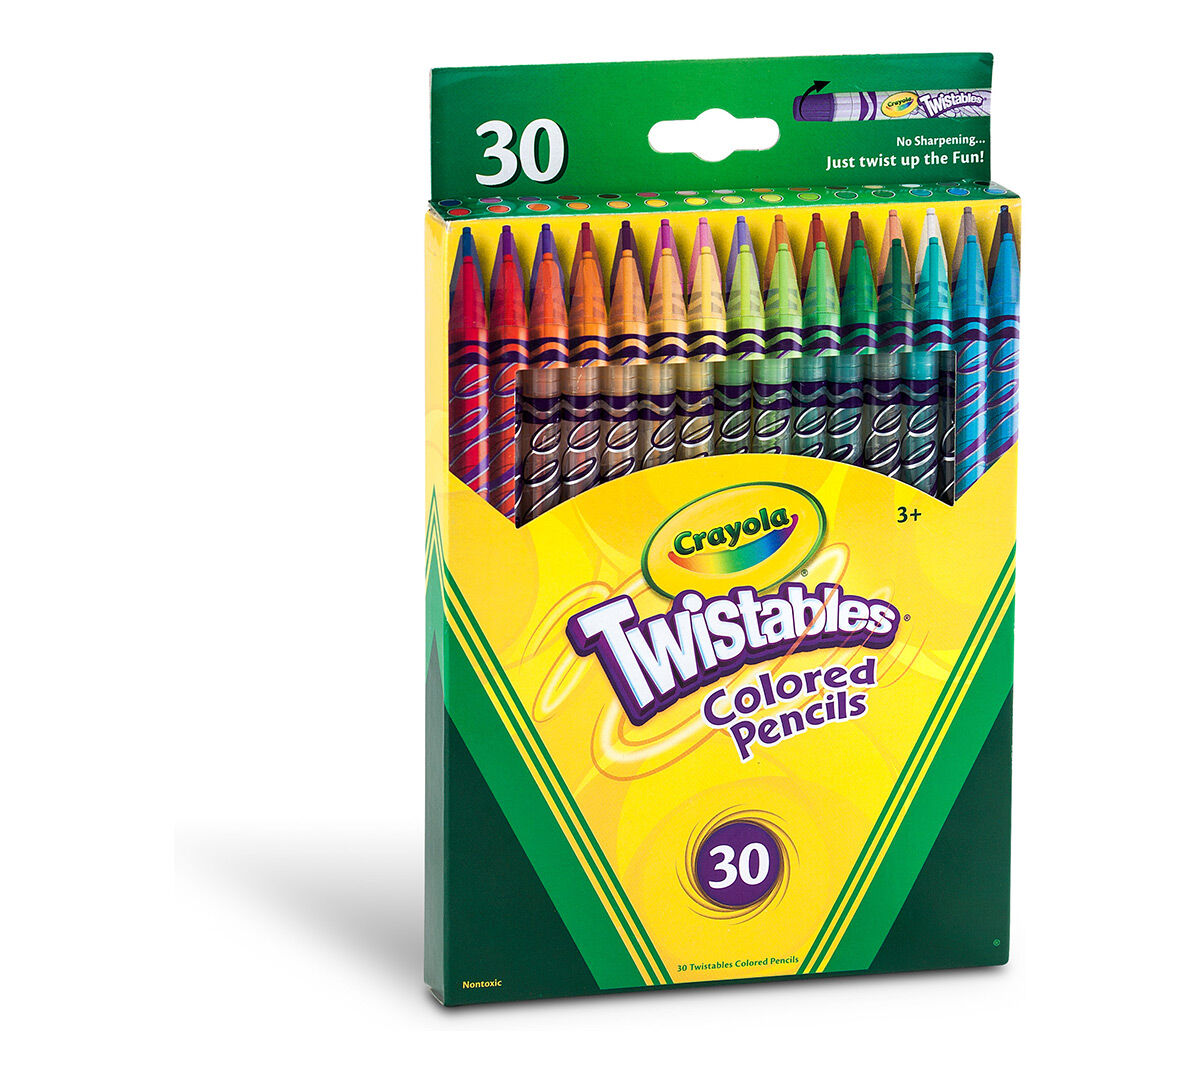 Crayola Twistables Colored Pencils Always Sharp Art